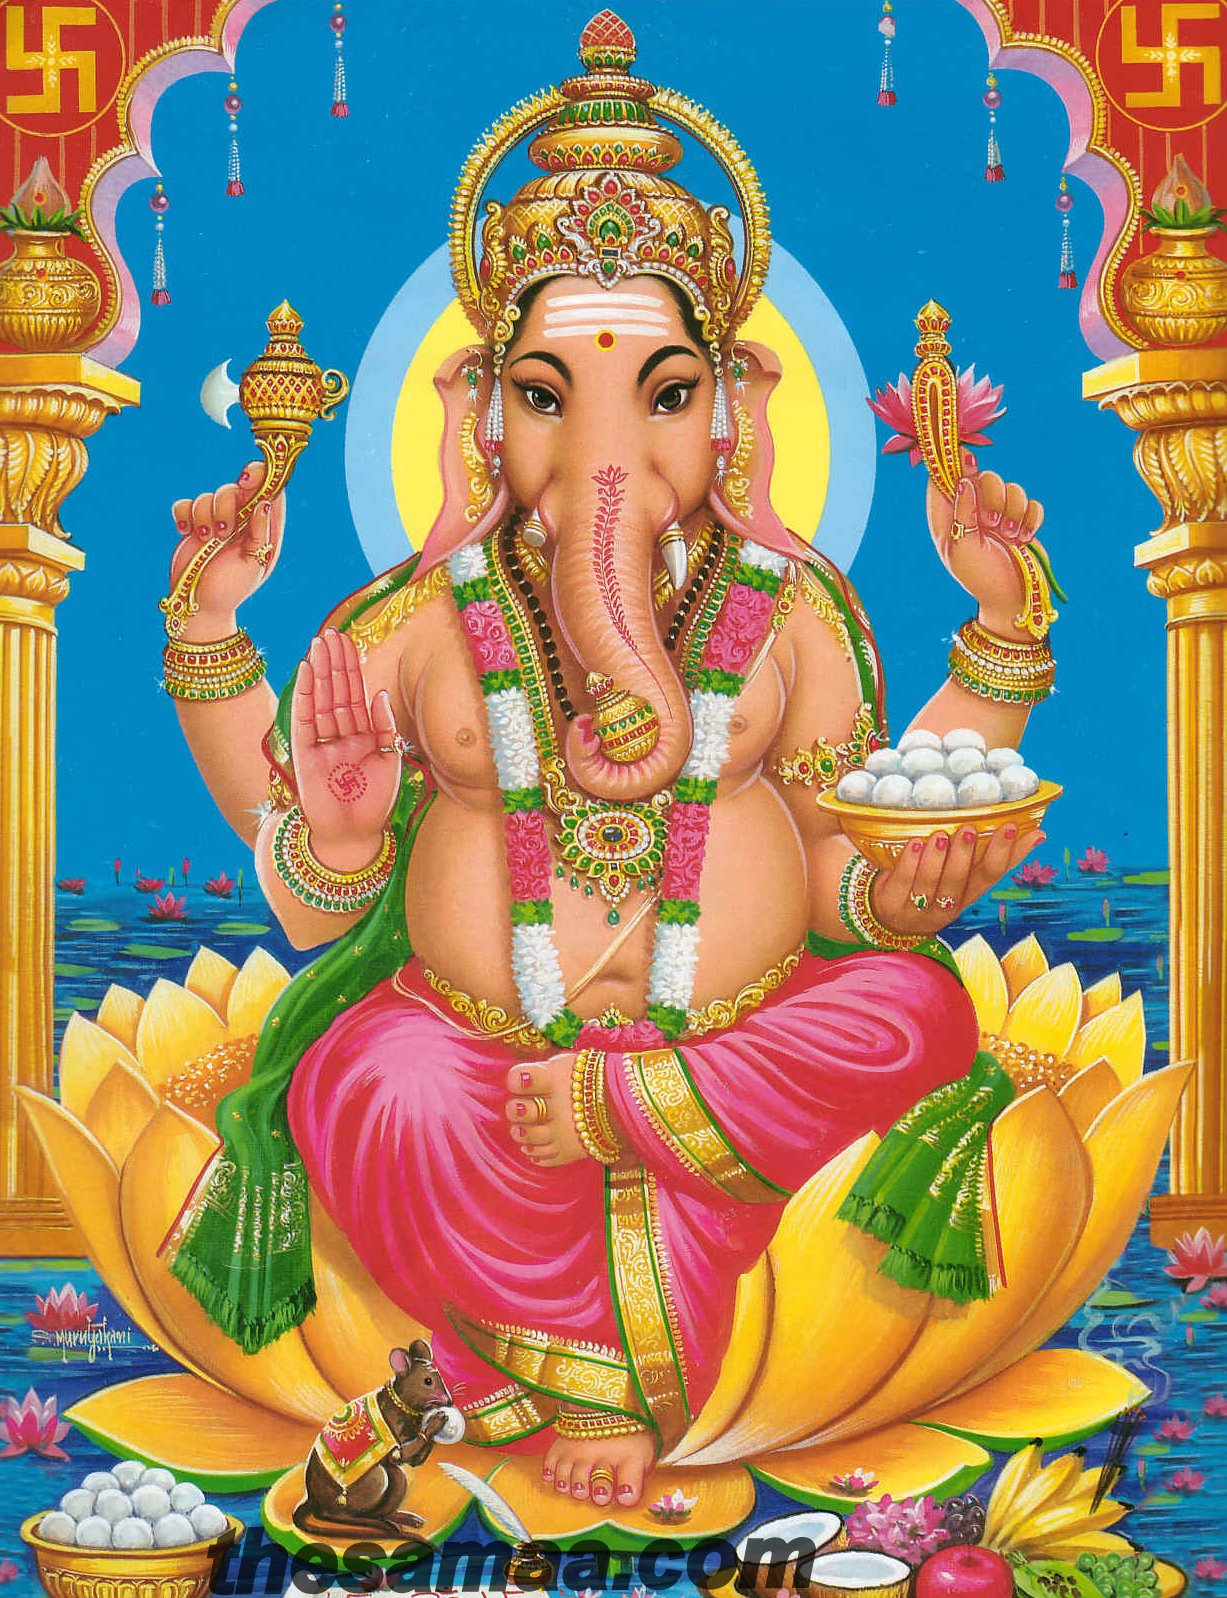 Ganesh chaturthi songs free download | kollywood updated.